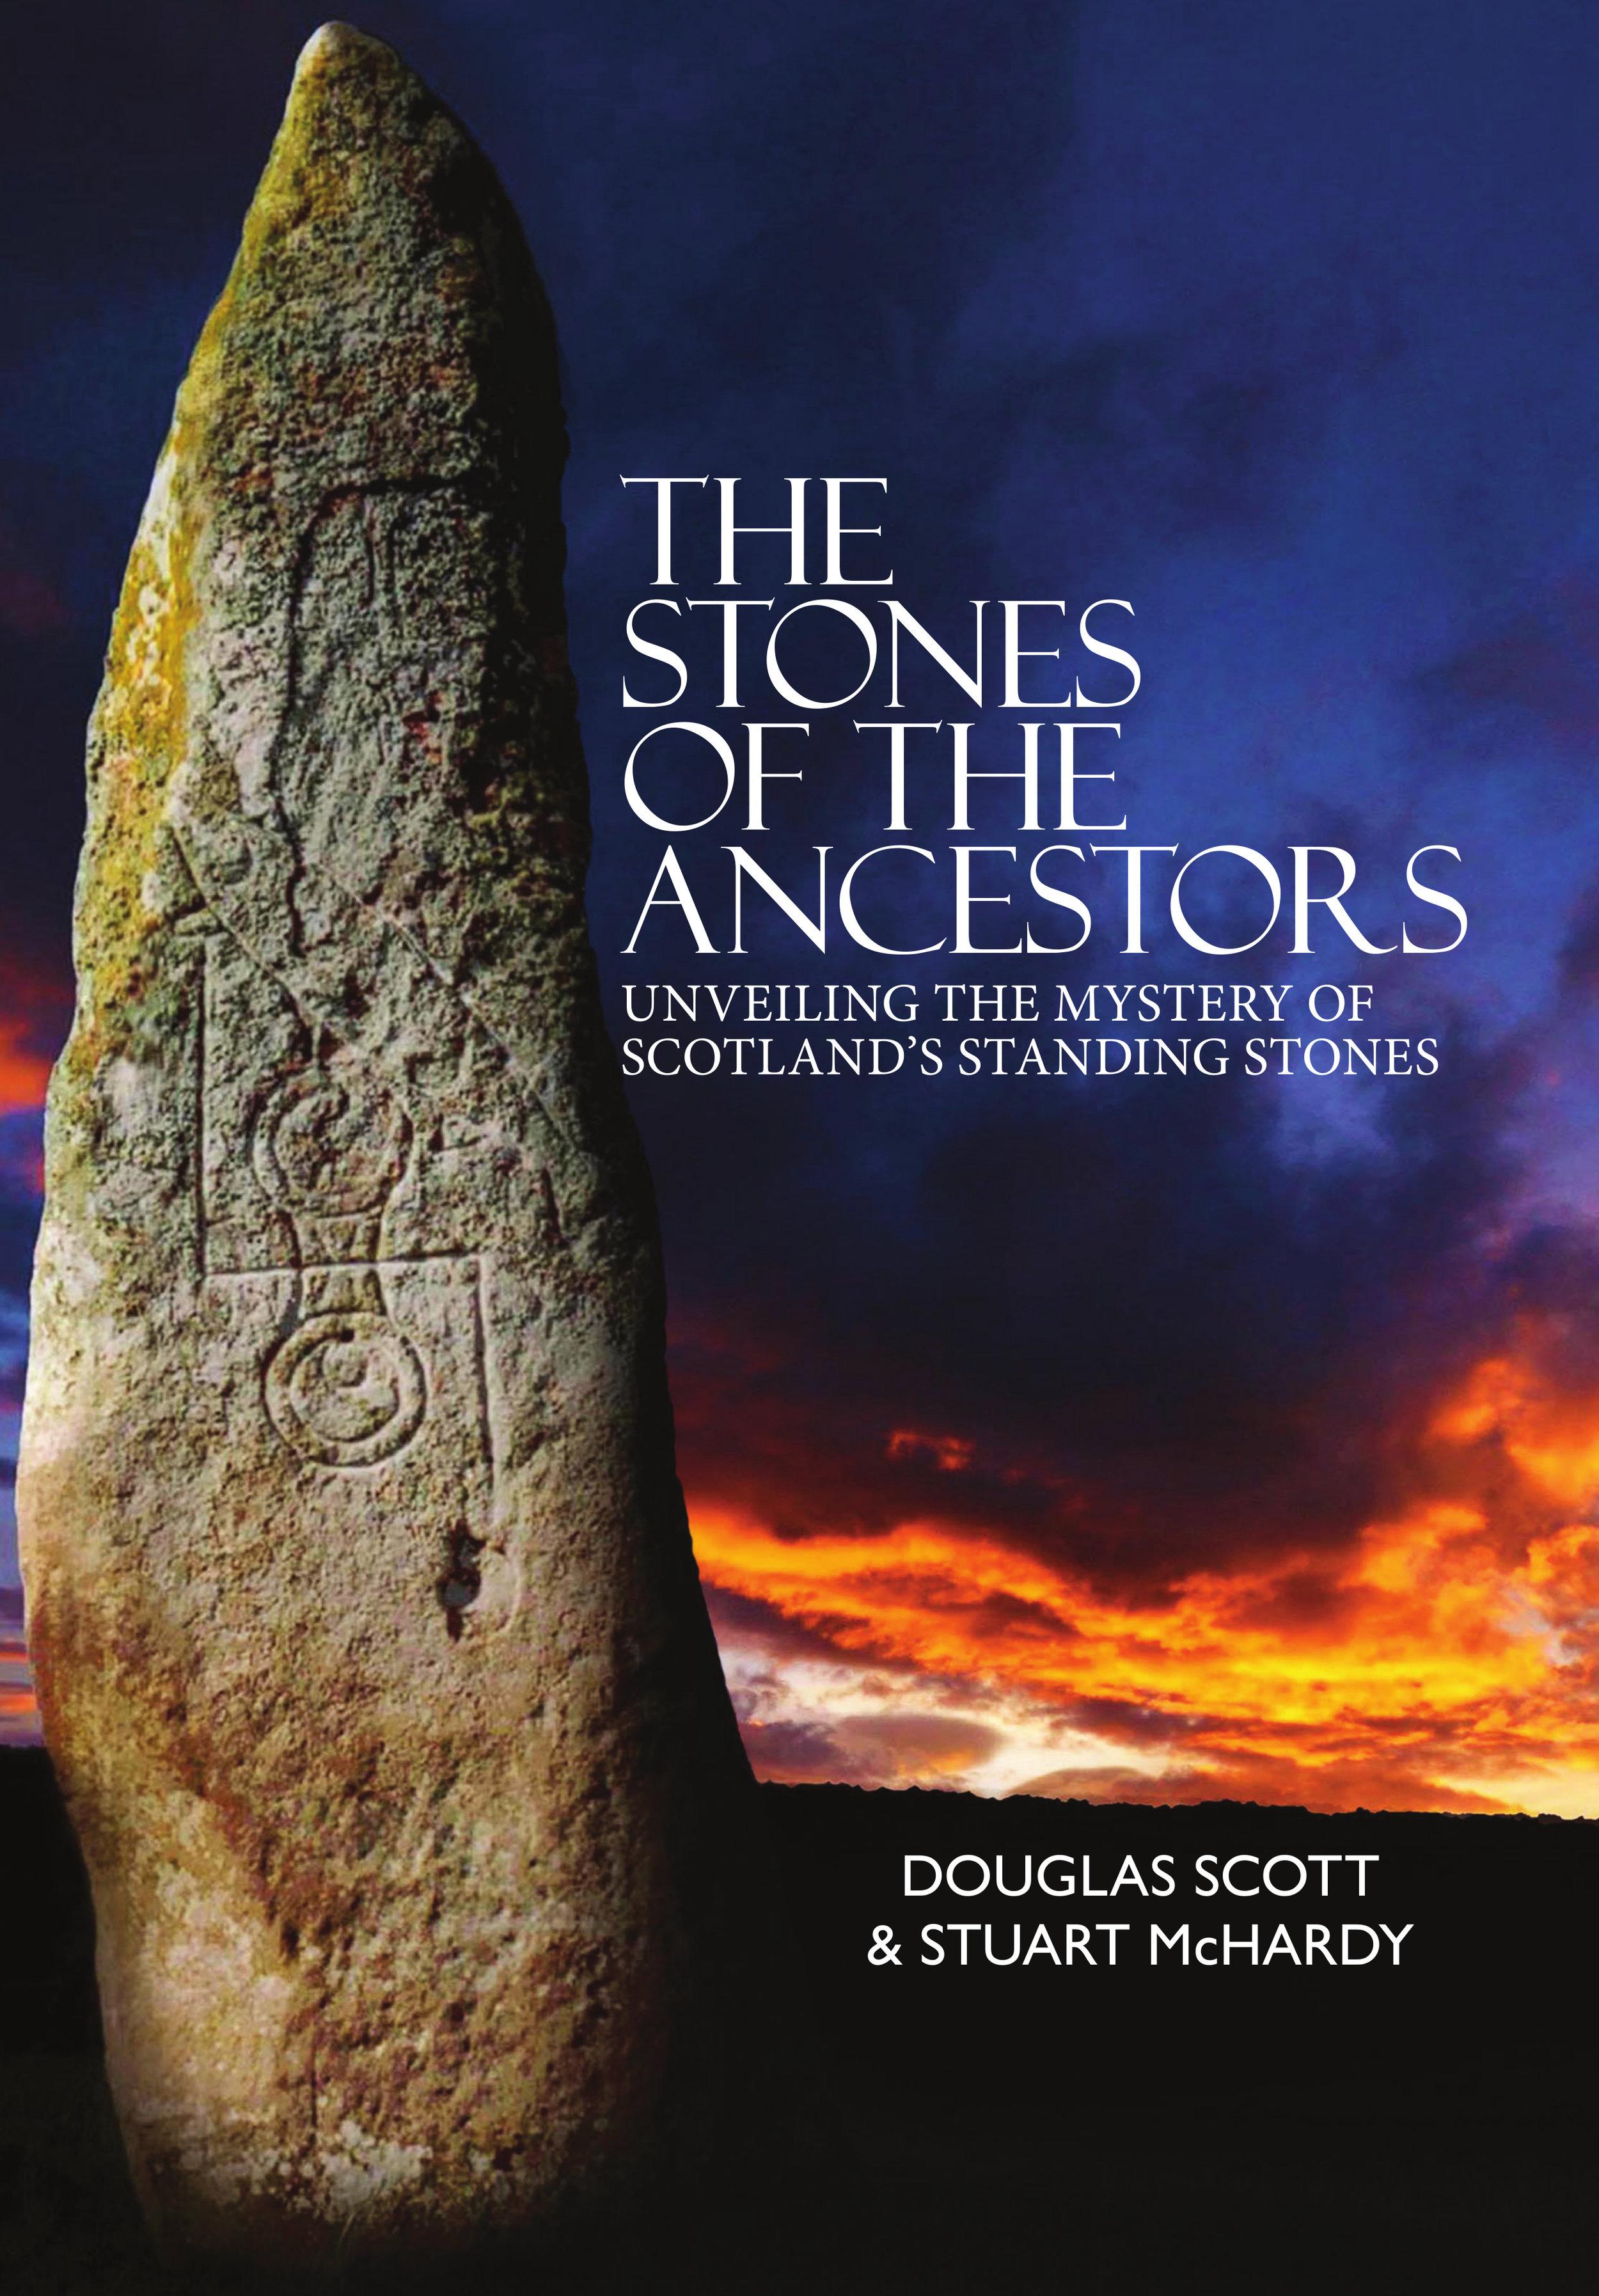 The Stones of the Ancestors Stuart McHardy & Douglas Scott 9781912147809 Luath Press.jpg